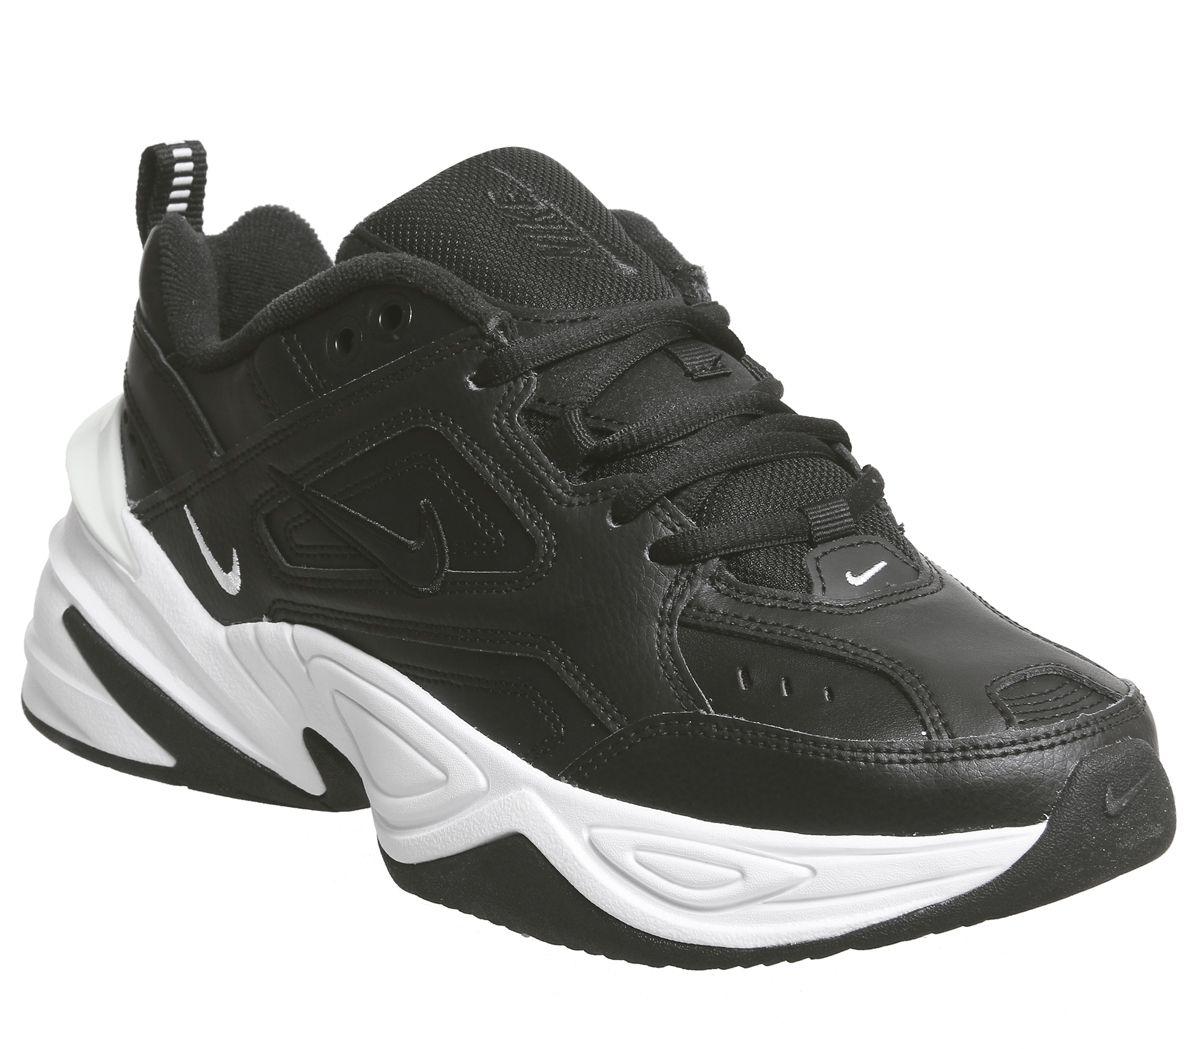 innovative design d492c 98673 Nike M2k Tekno Trainers Black Black White - Hers trainers